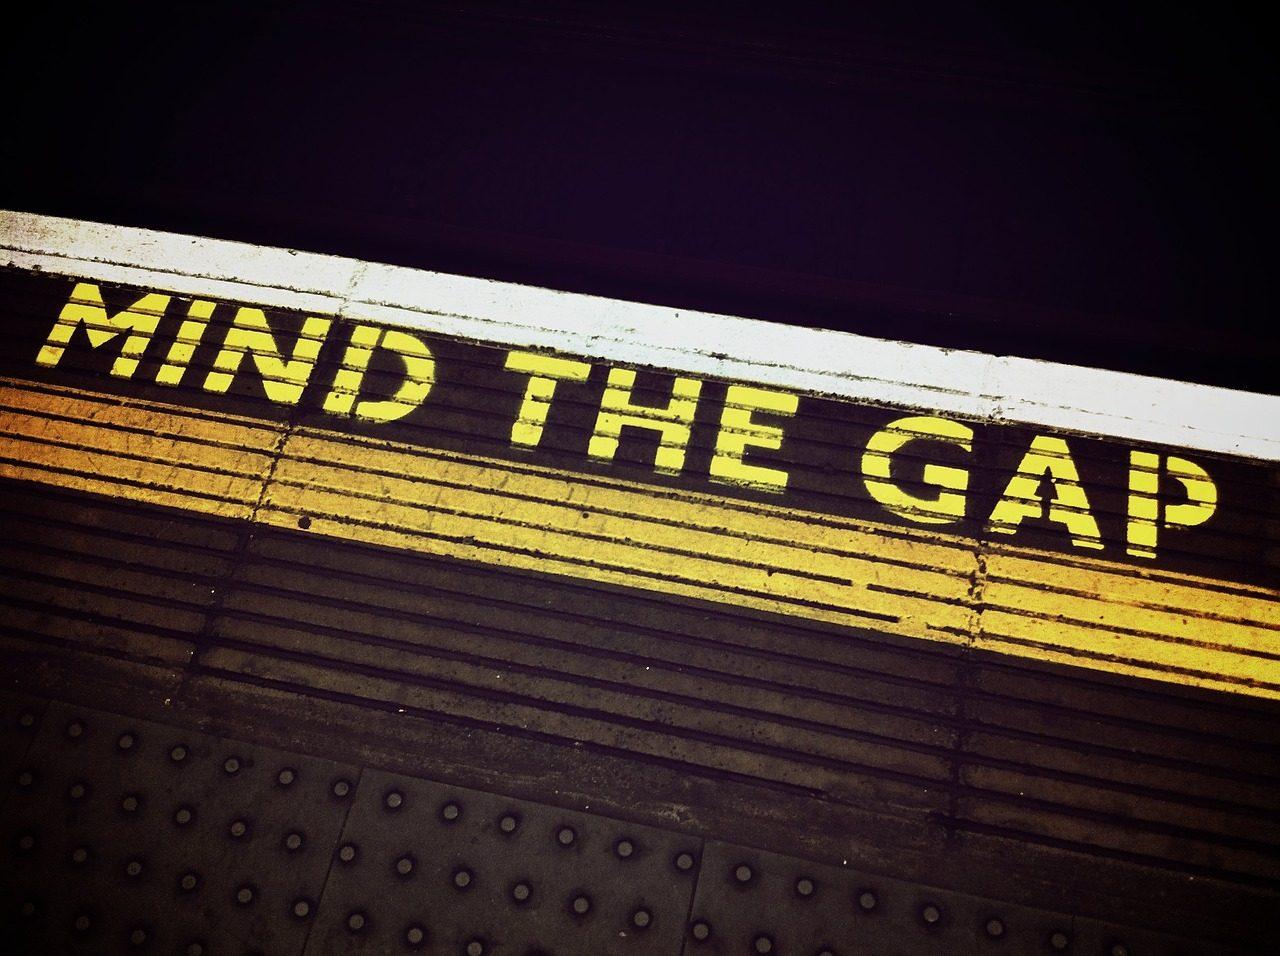 mind-the-gap-1876790_1280-1280x956.jpg